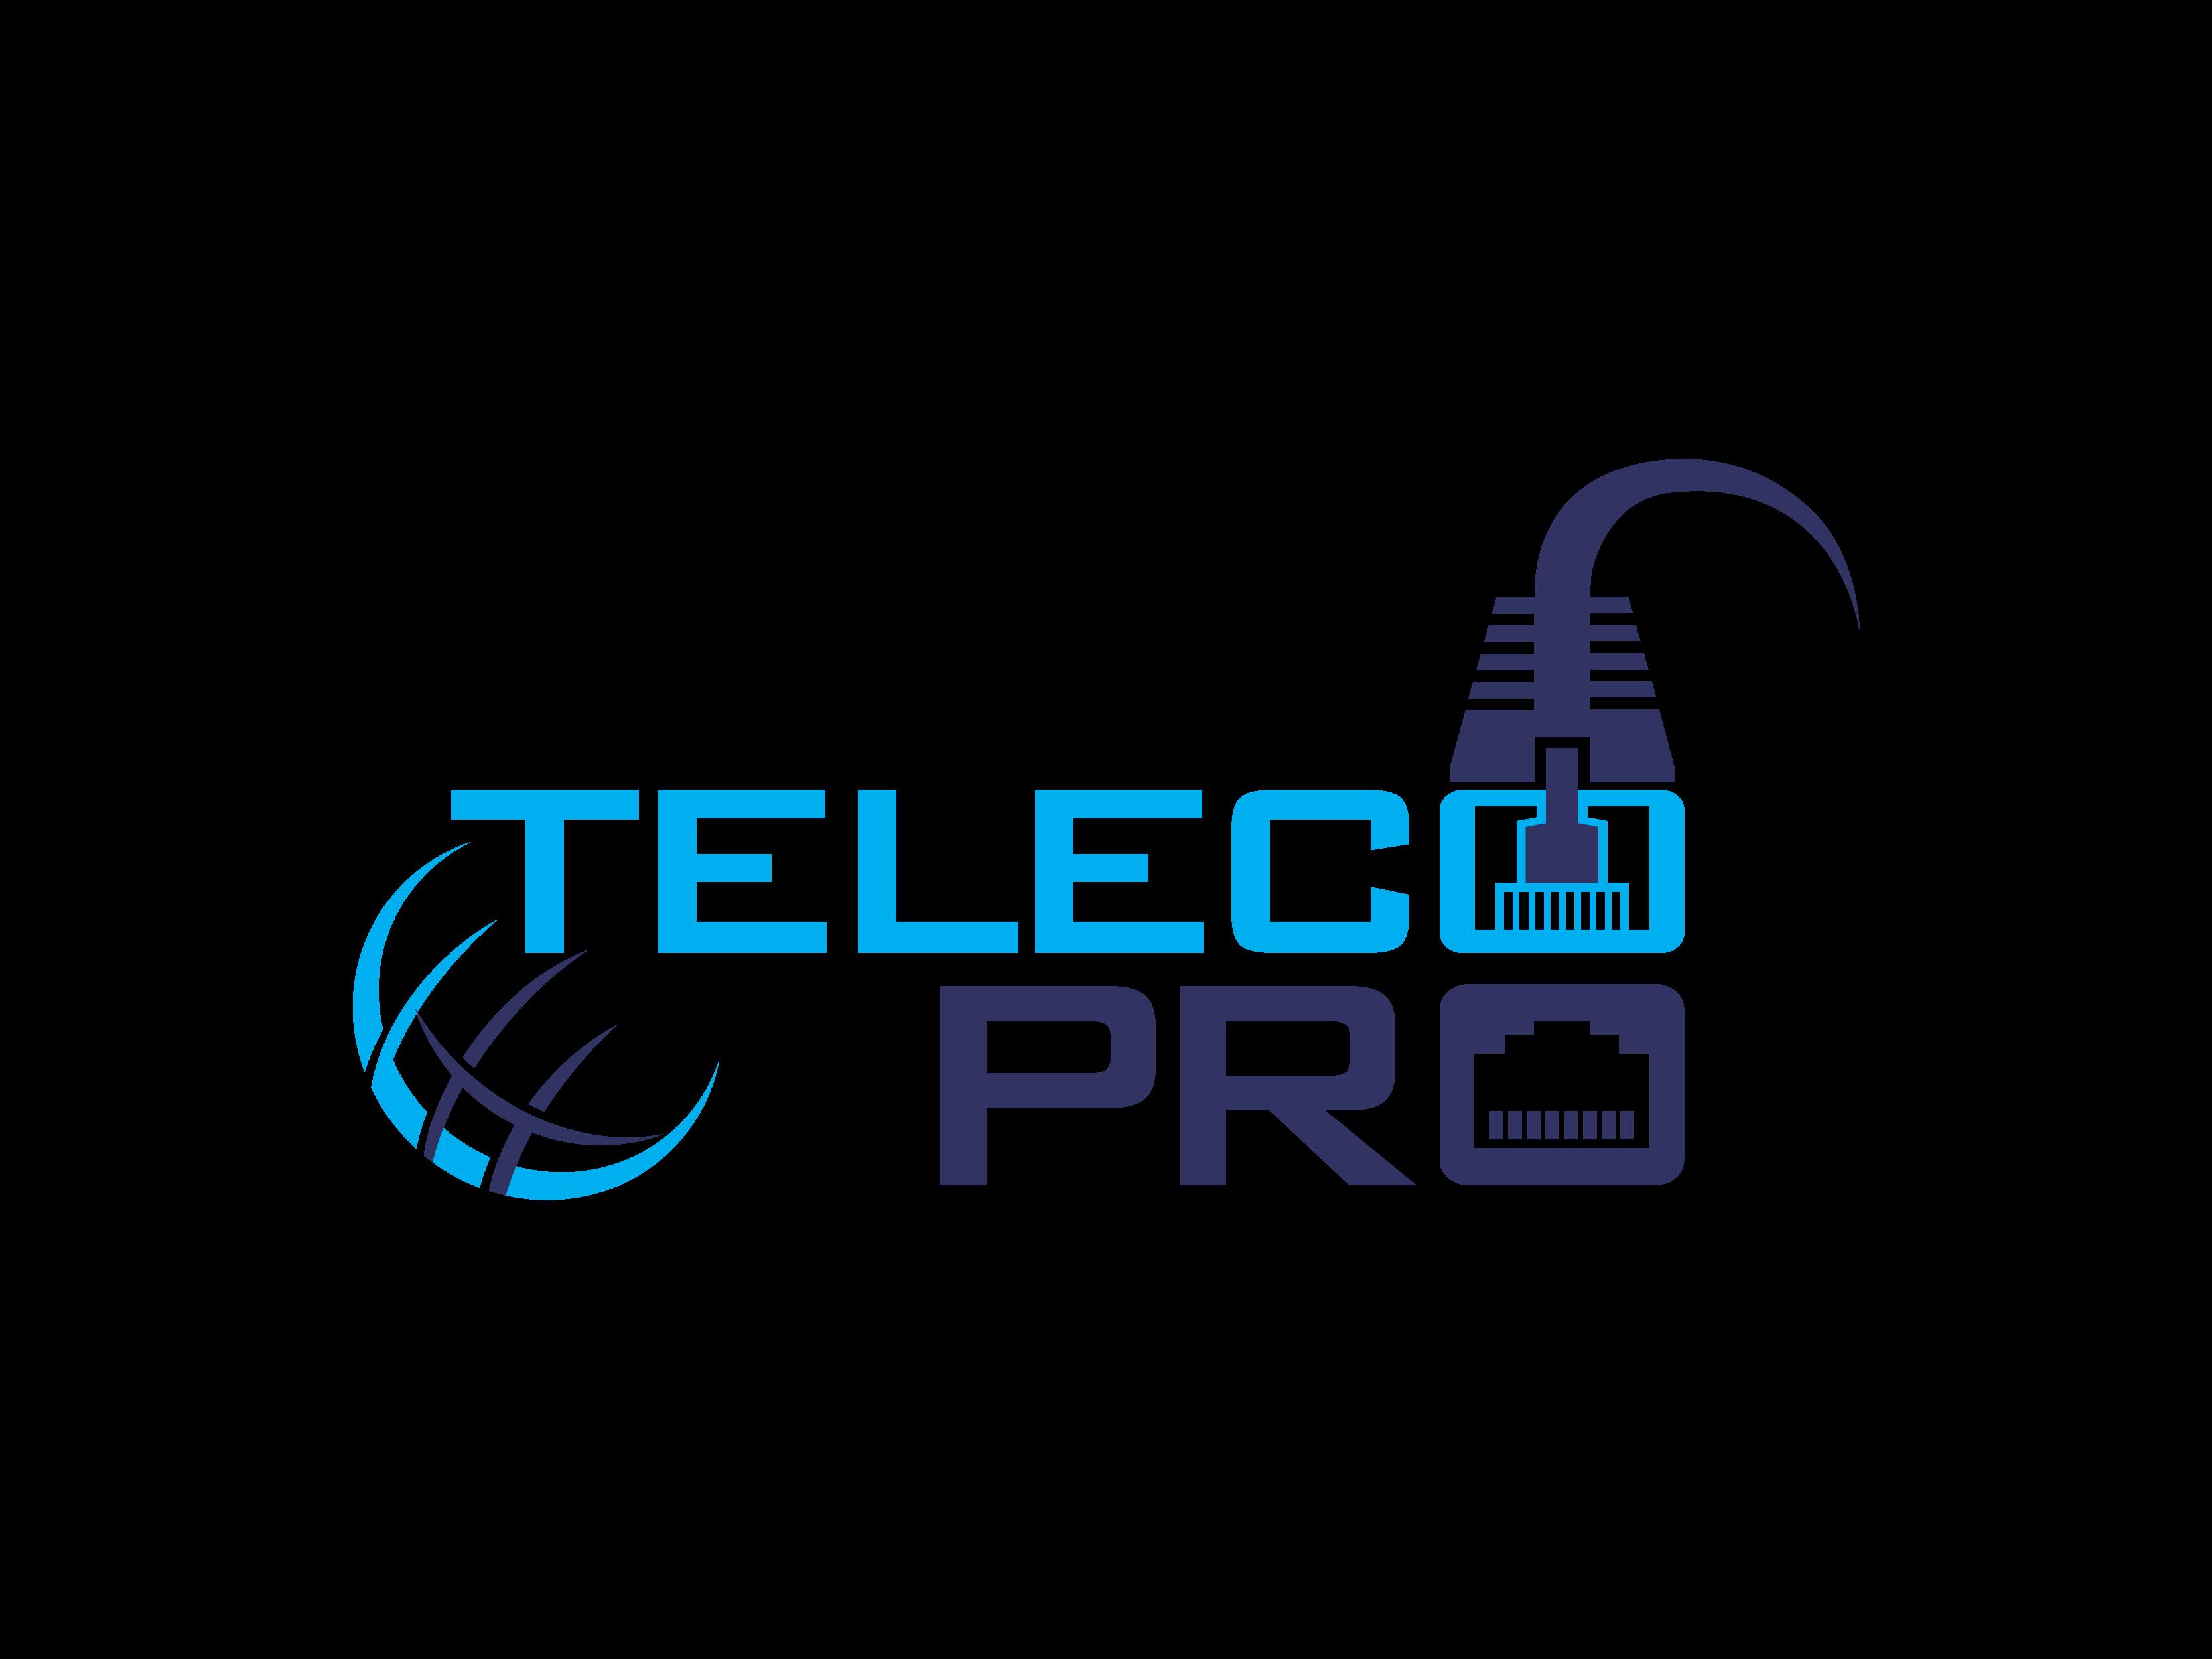 Teleco Pro LLC